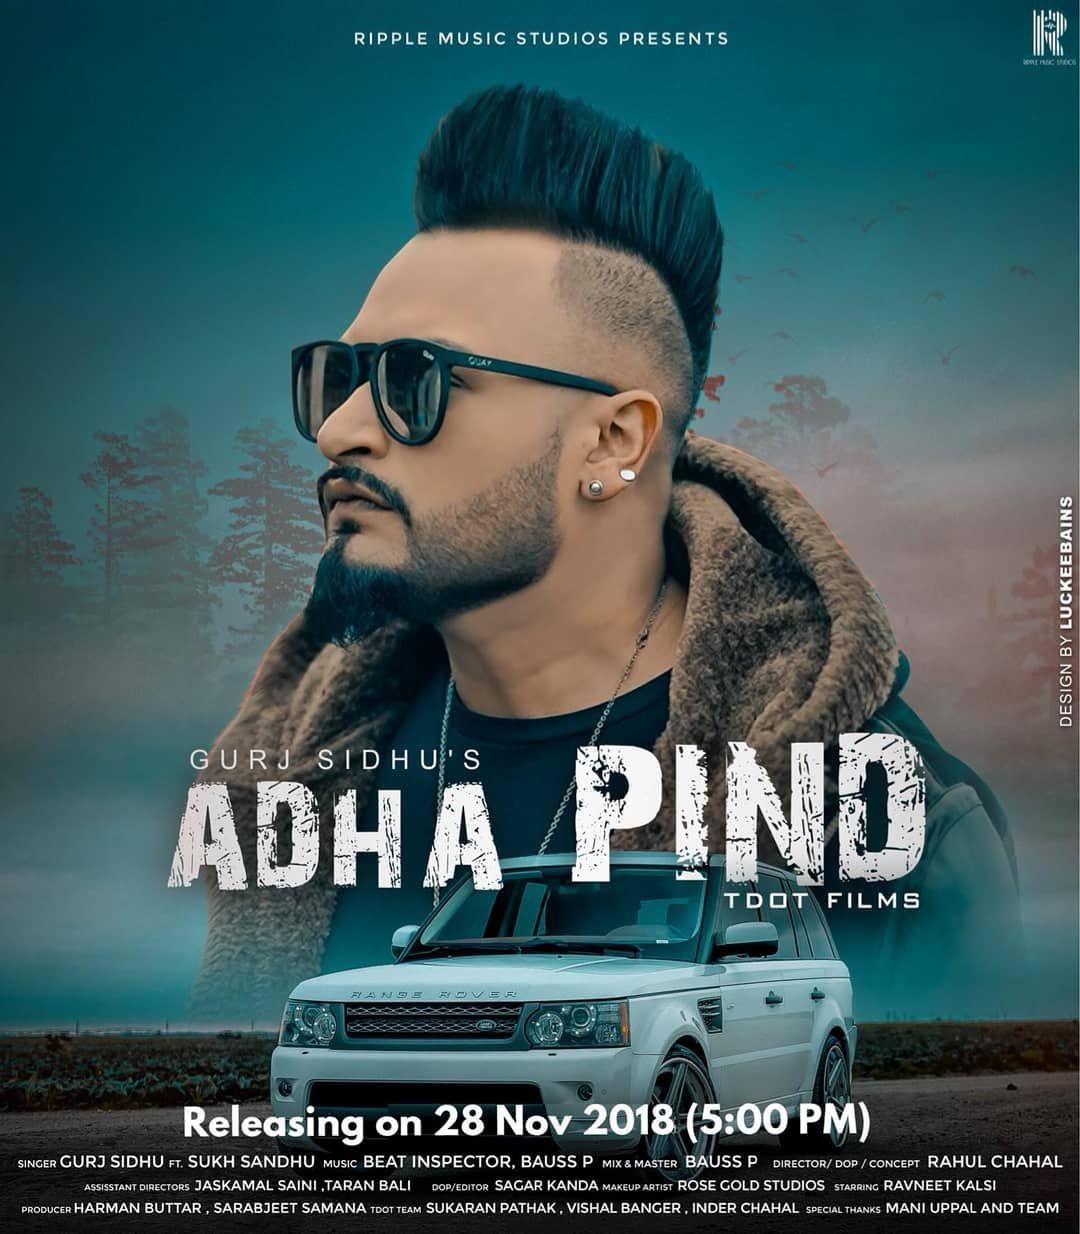 Adha Pind Machaya Pya Mp3 Song Belongs New Punjabi Songs Adha Pind Machaya Pya By Gurj Sidhu Adha Pind Machaya Pya Available To Free Songs Mp3 Song News Songs